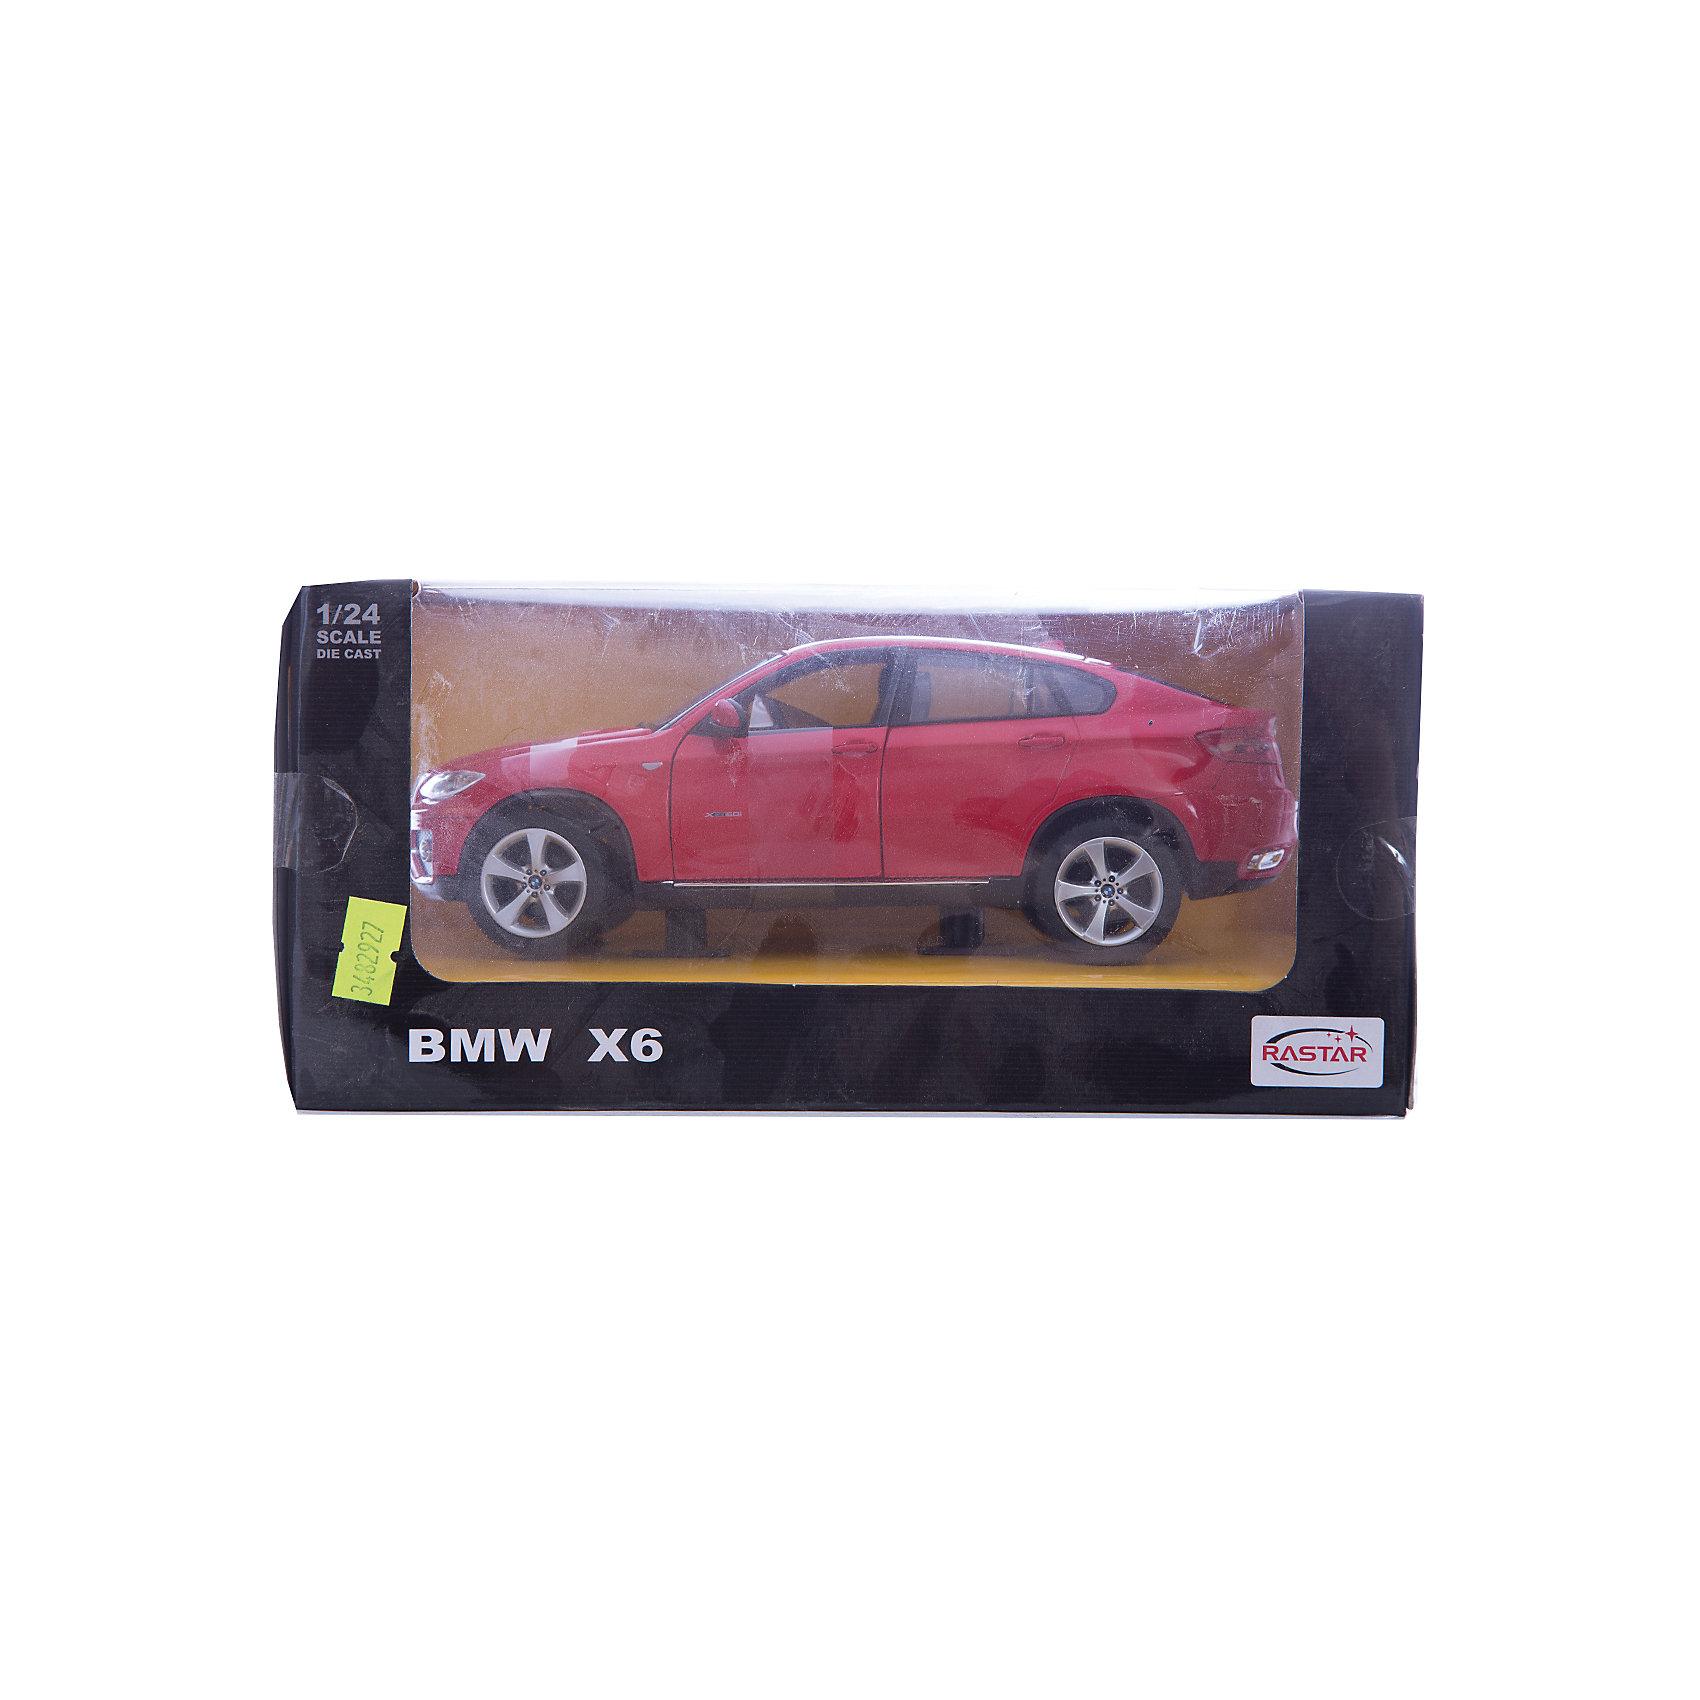 - Машина 1:24 BMW X6, RASTAR машины gk racer series машина р у bmw x6 со светом на батарейках